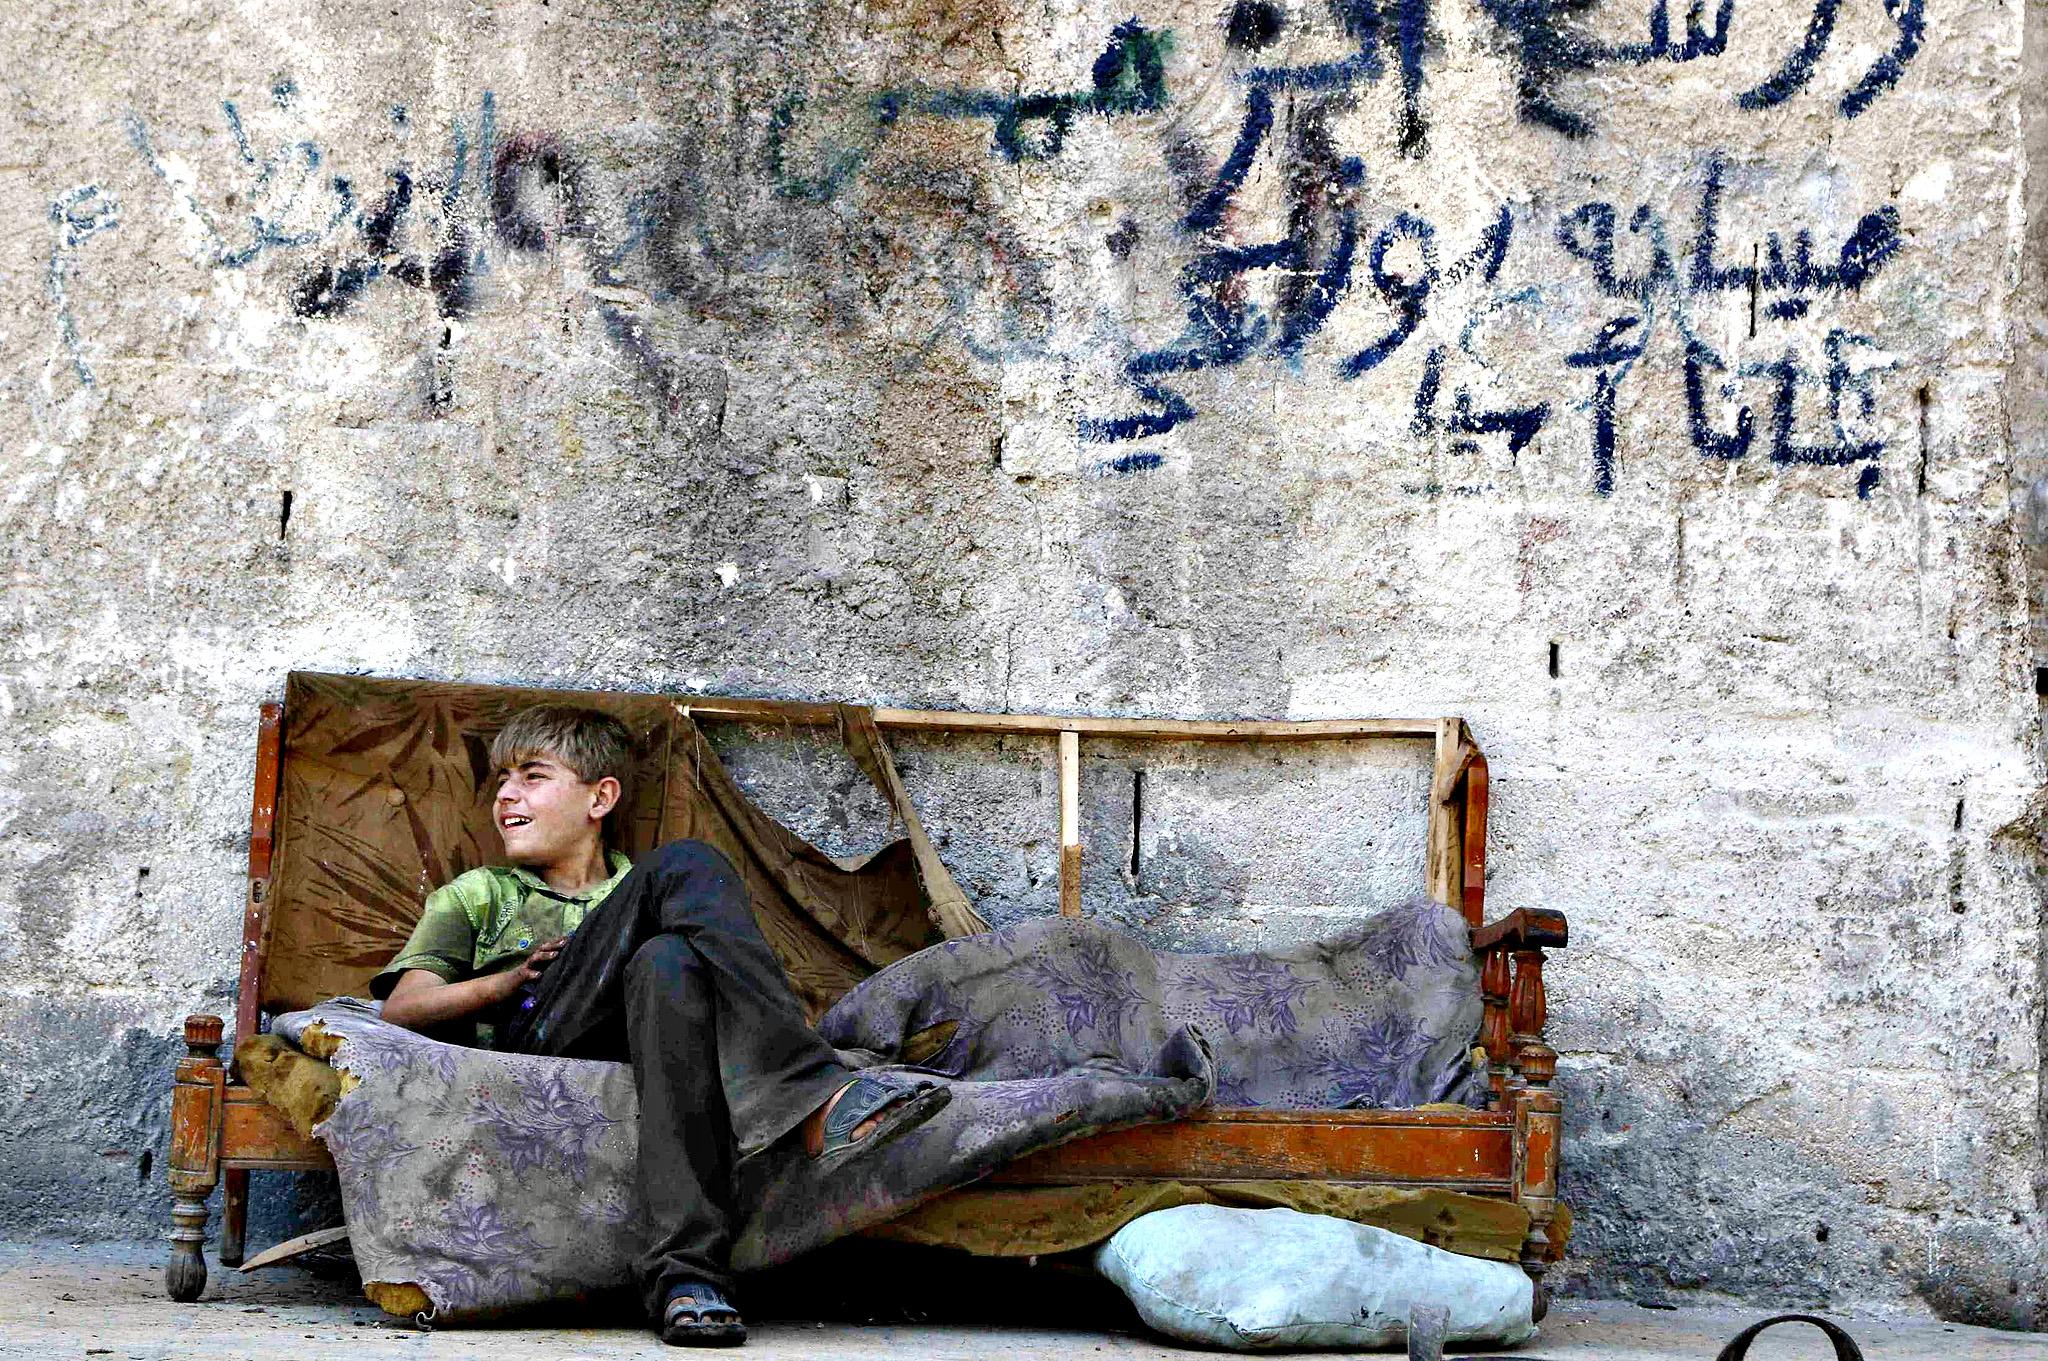 A boy sits on a sofa along a street in the Al-Fardous neighbourhood of Aleppo July 15, 2014.